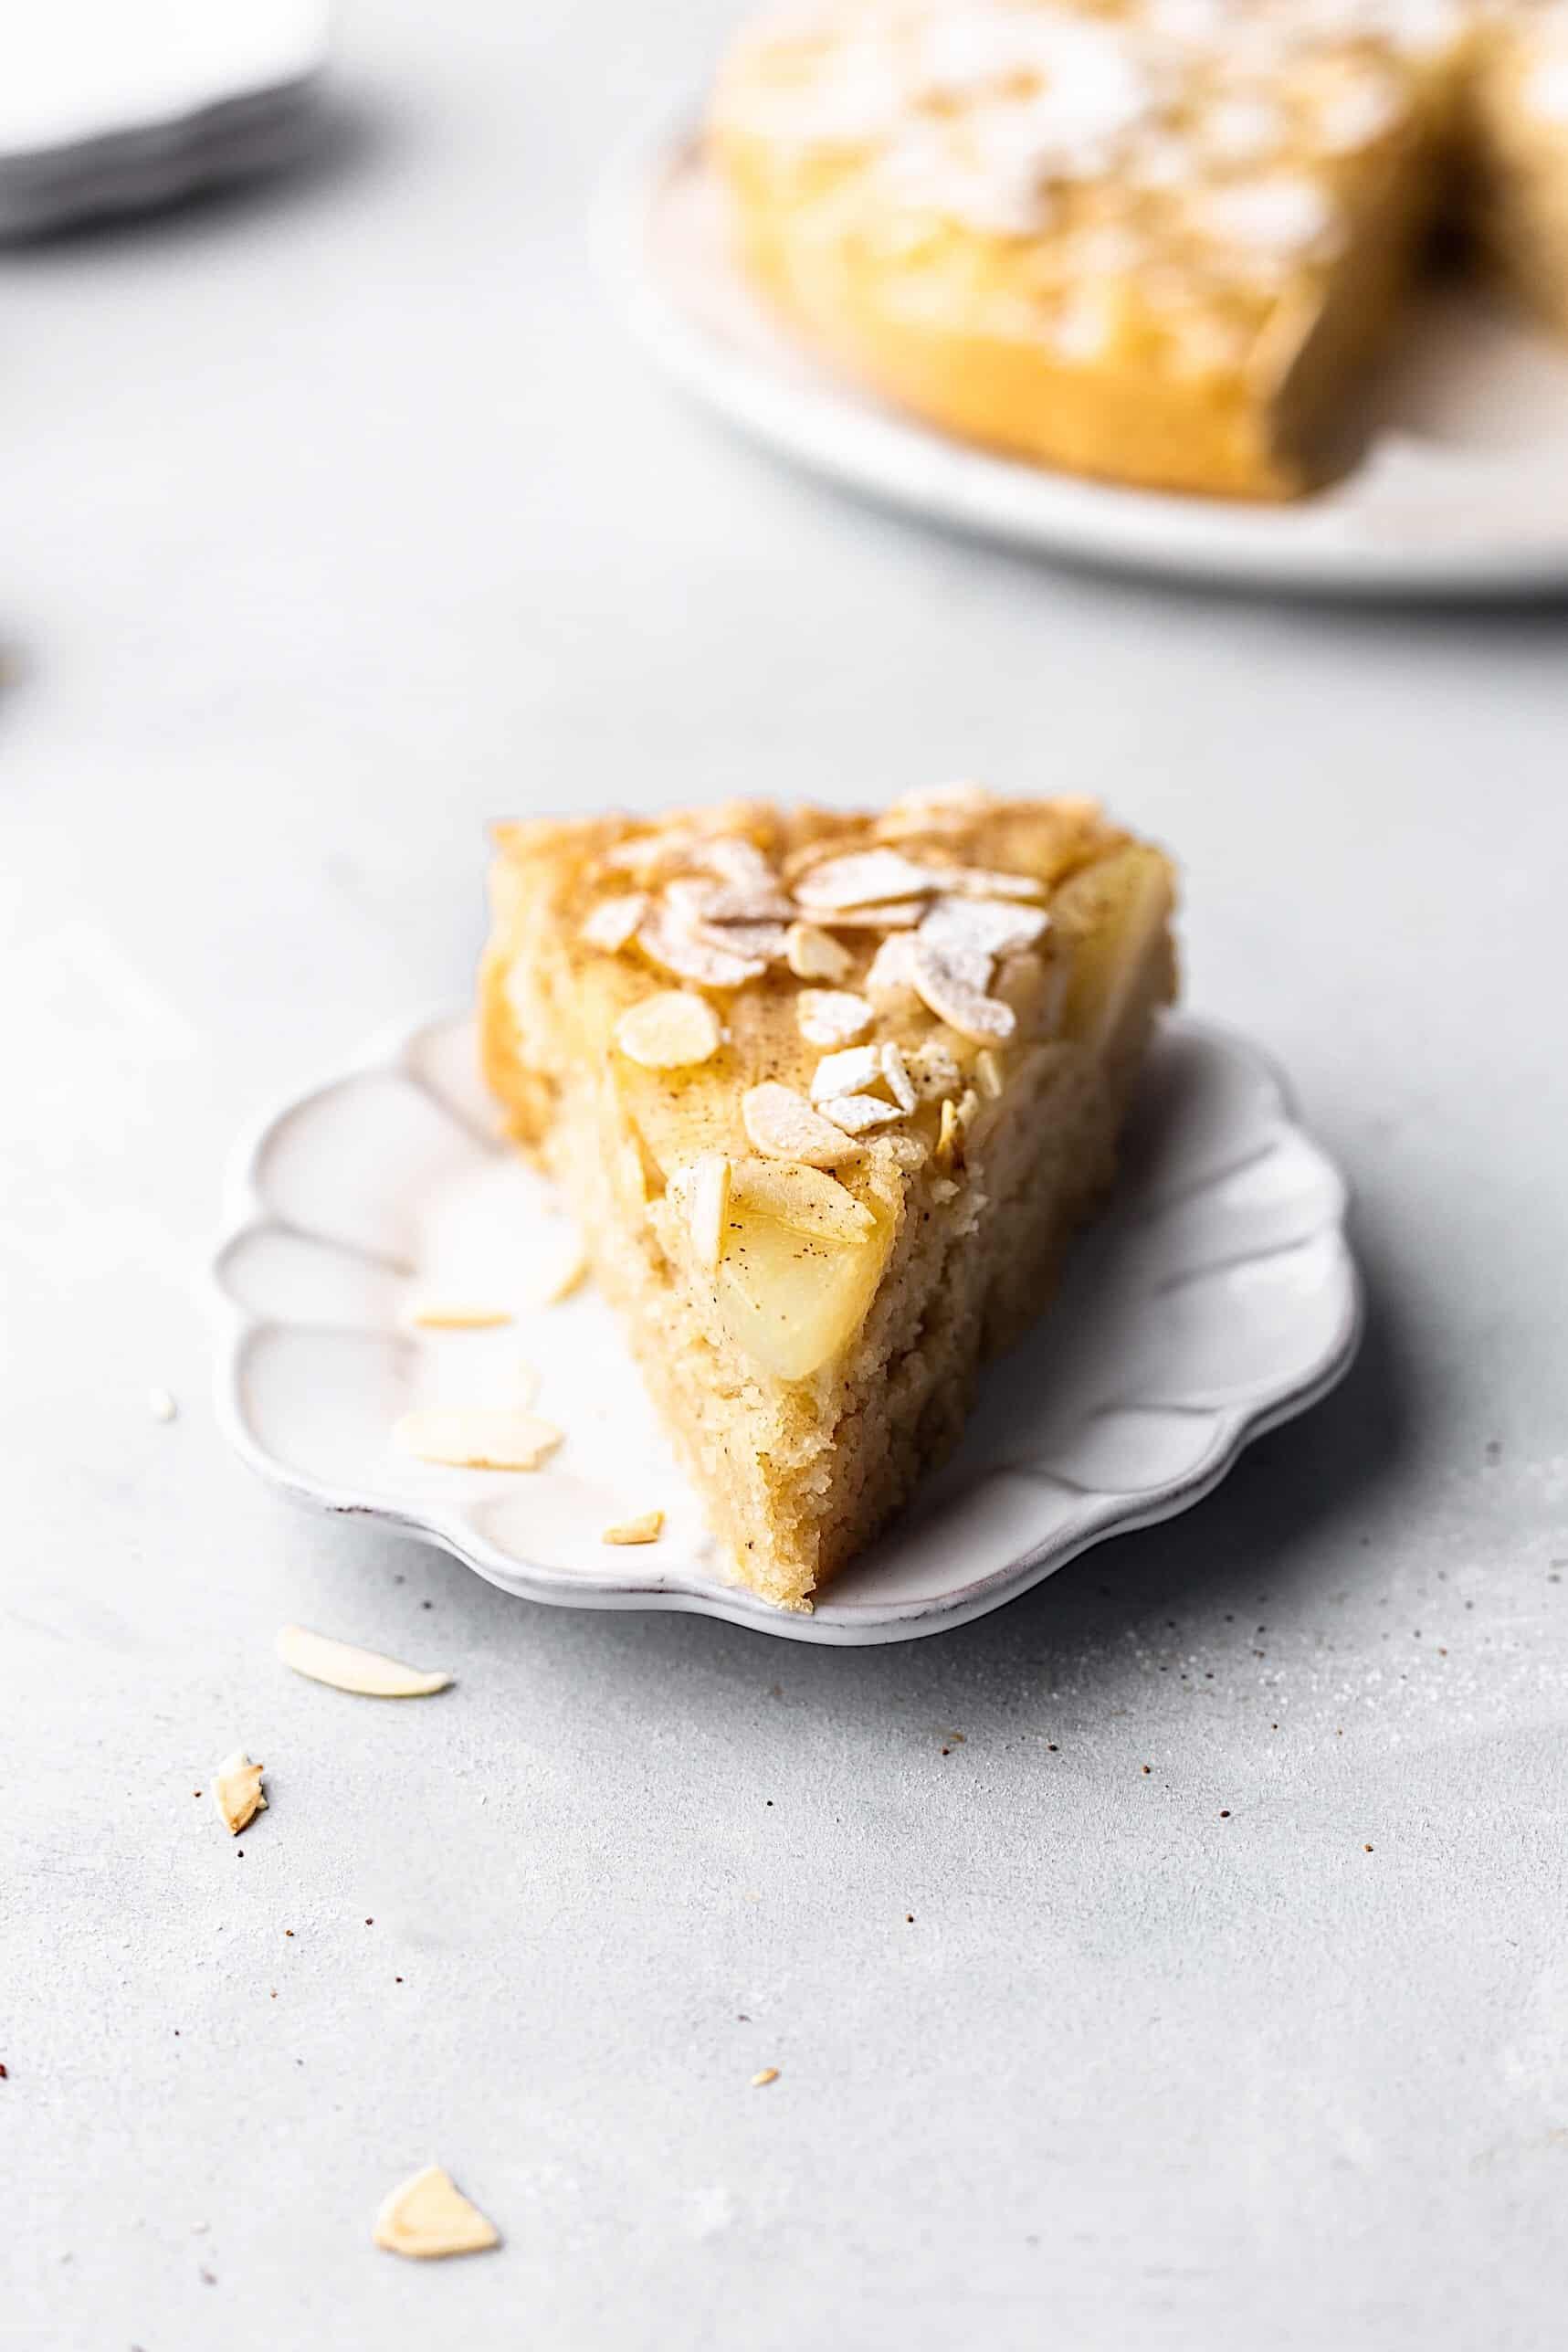 Vegan Upside Down Pear Almond Cake #recipe #vegan #cake